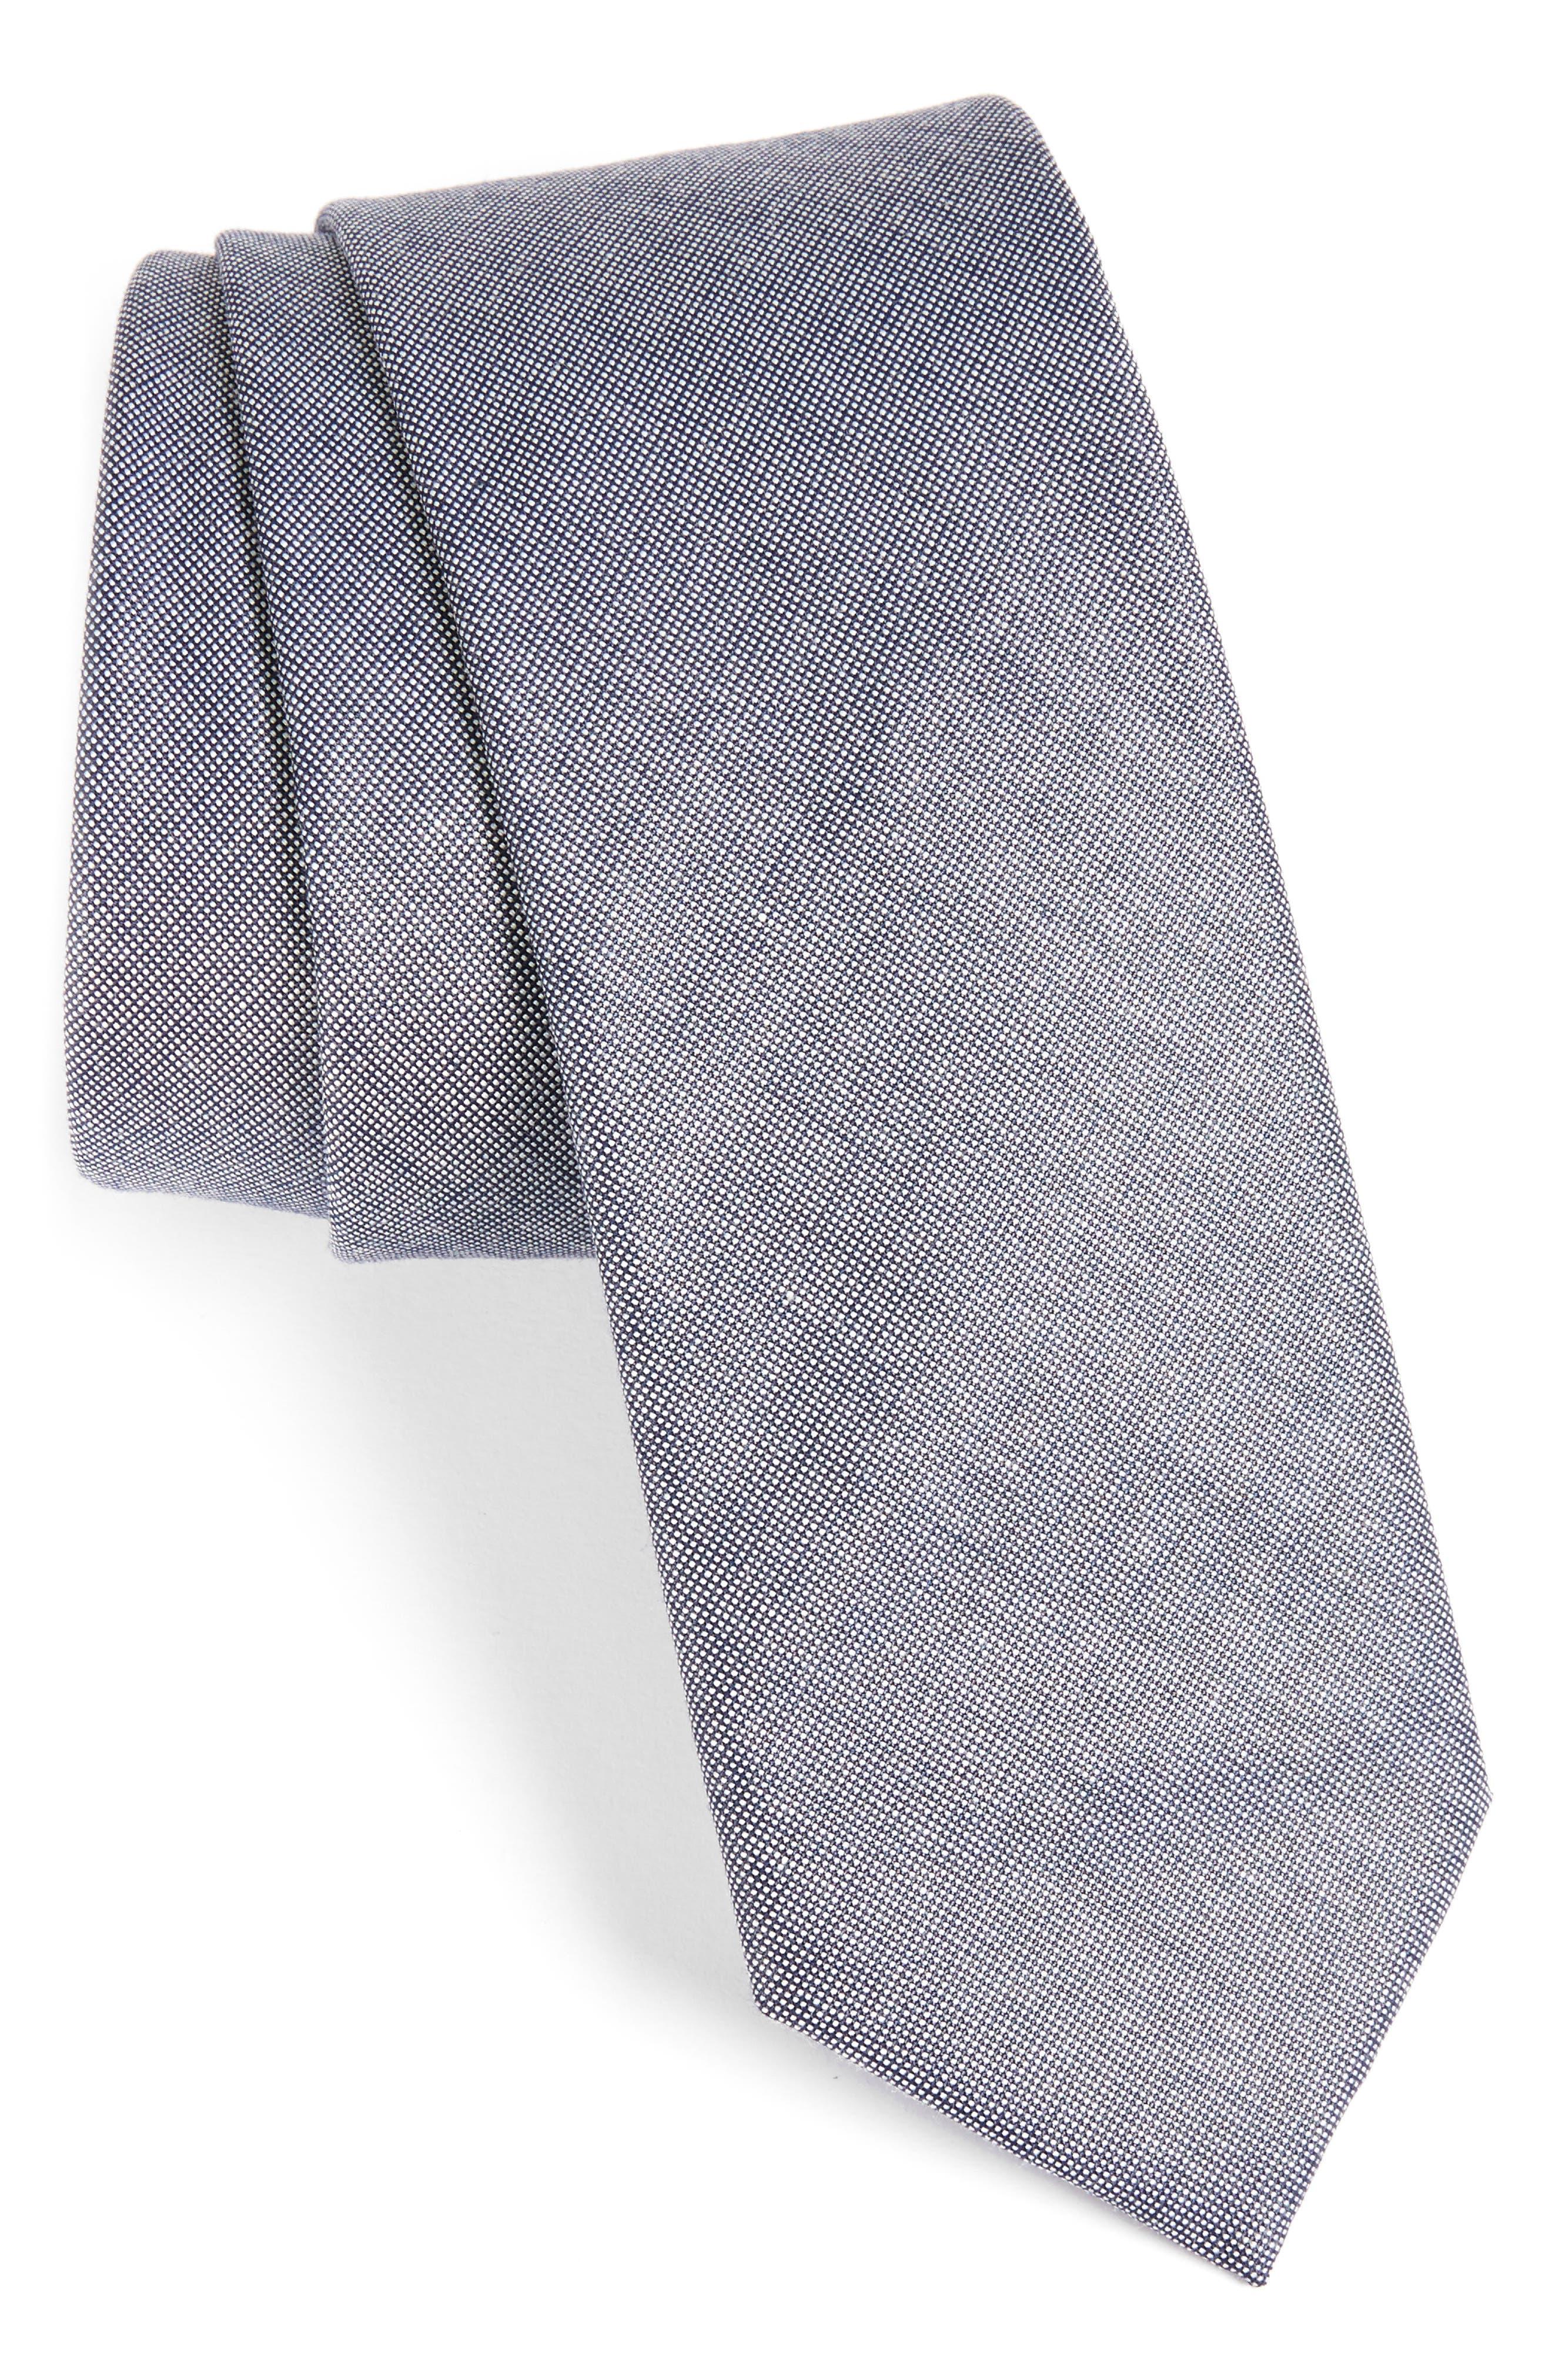 1901 Solid Cotton Blend Tie